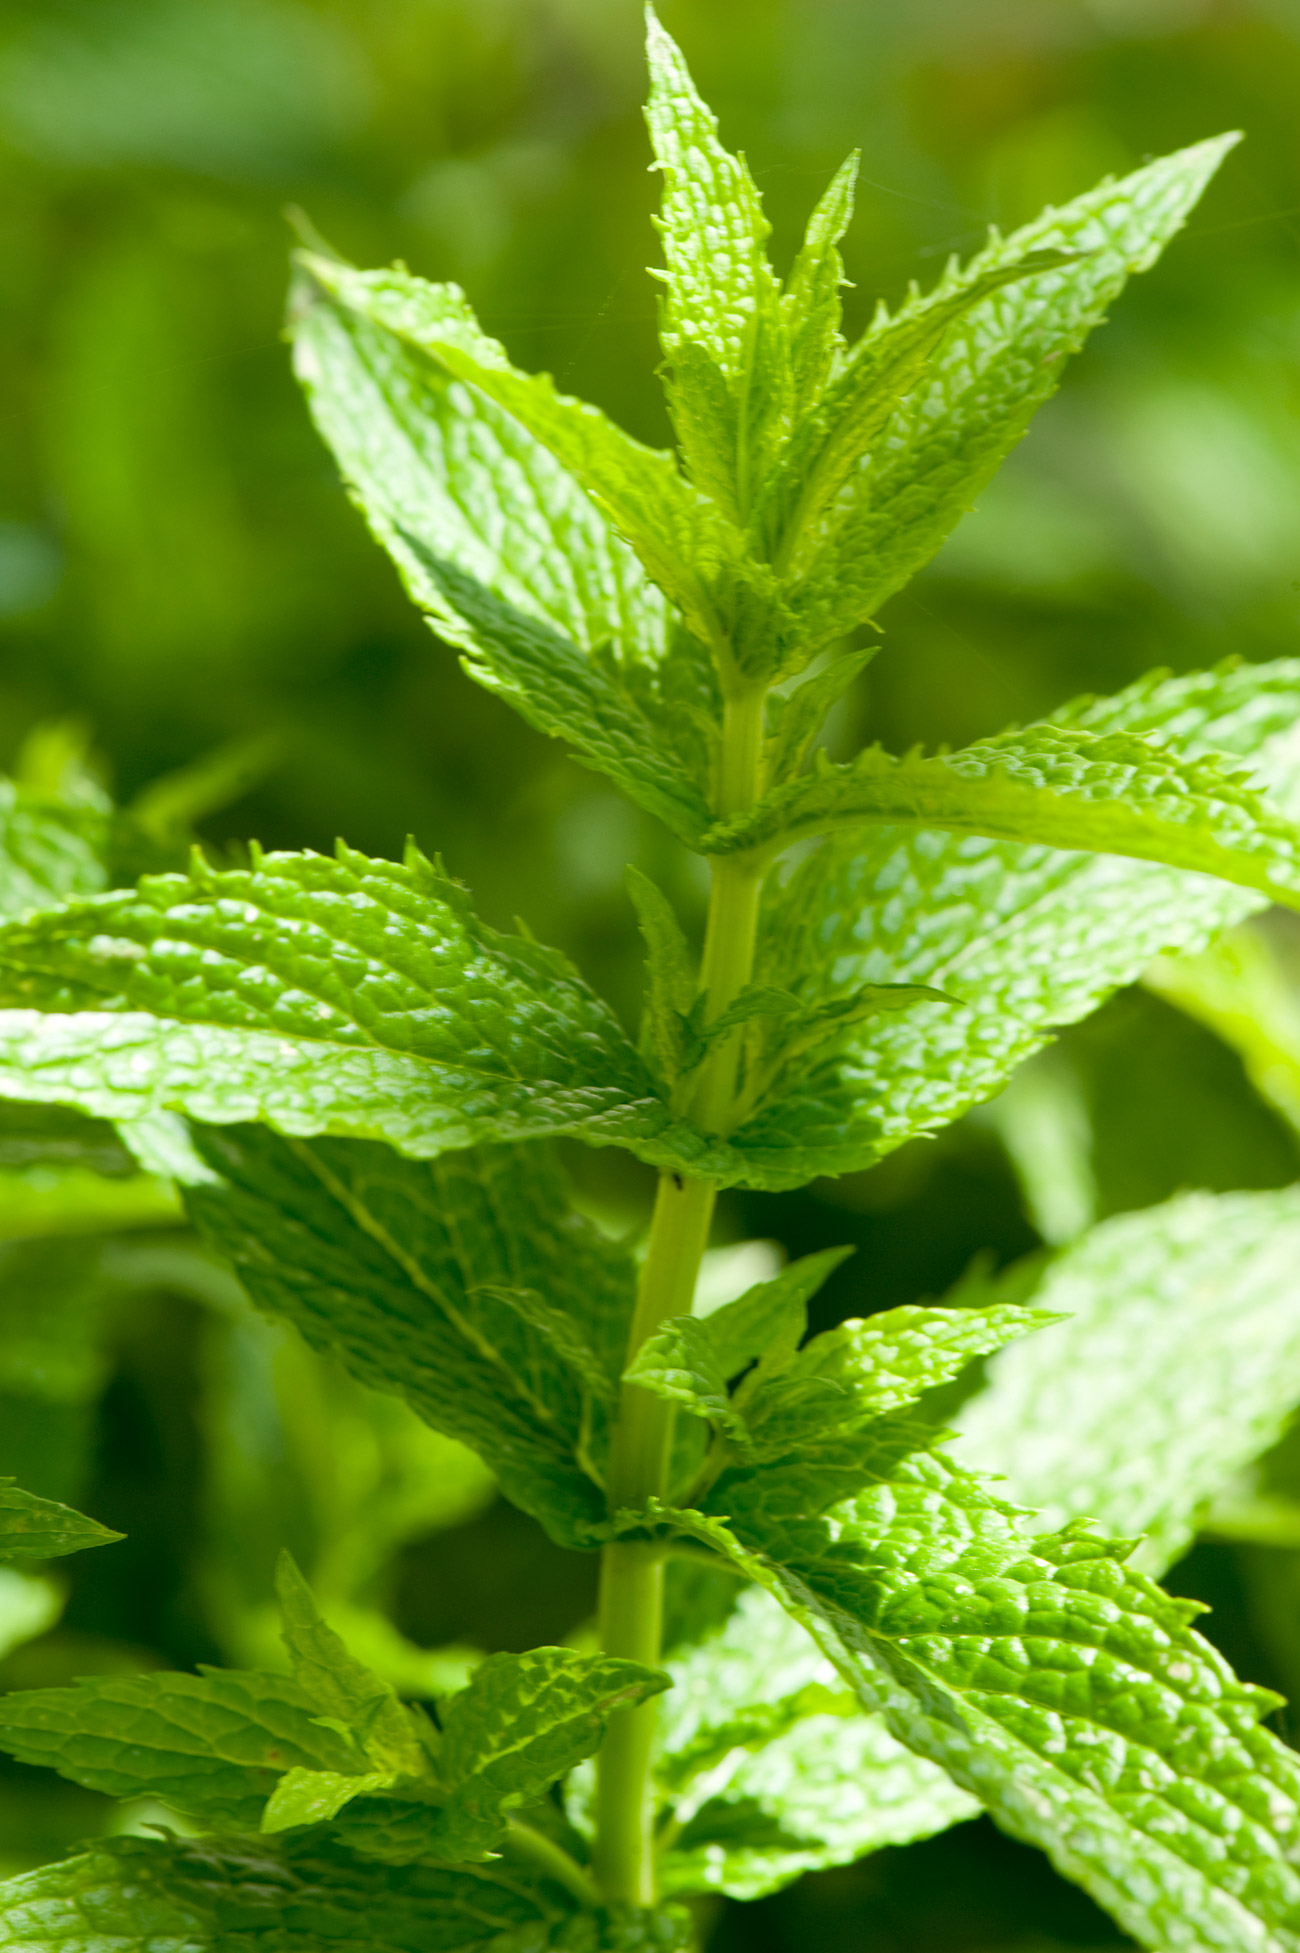 Spearmint: Green leafy plant